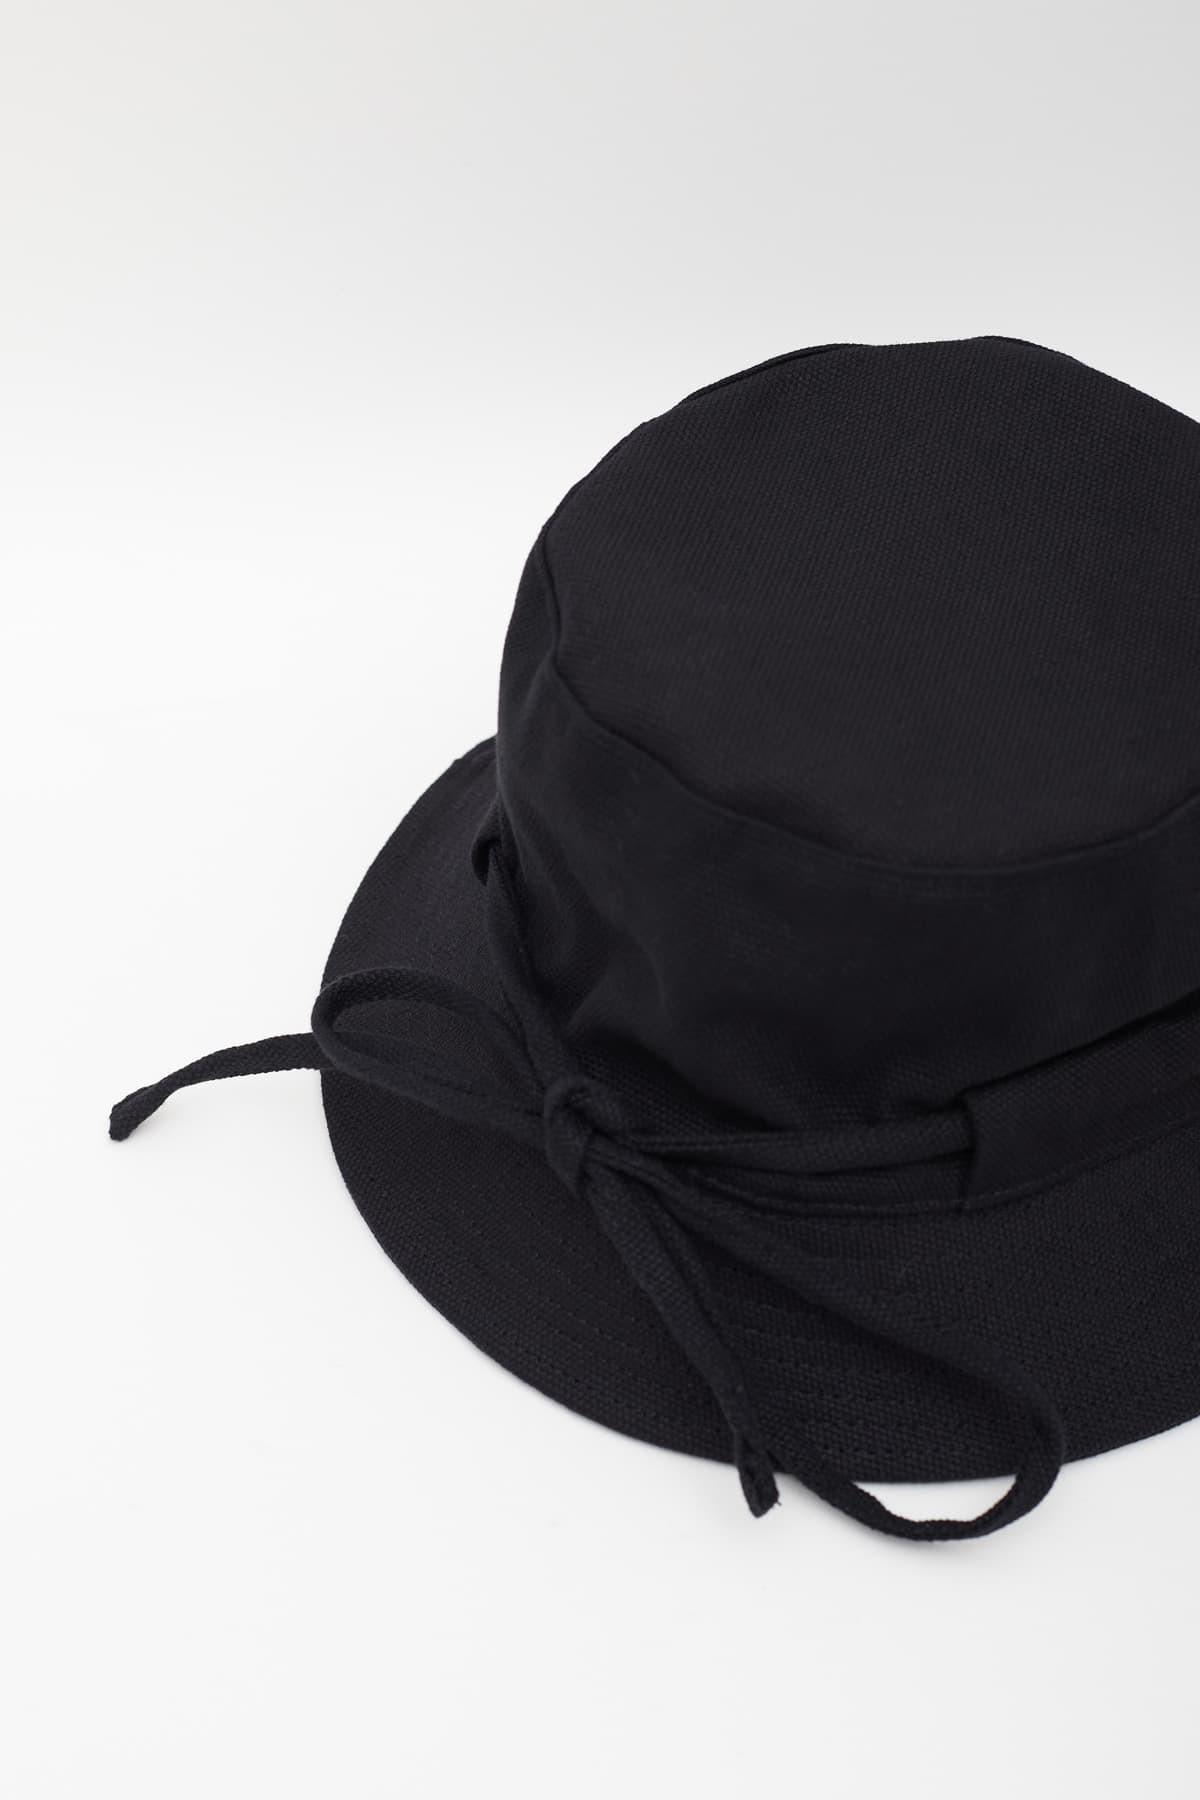 Comprar RASSVET Black Hurt LS T-Shirt PACC9T003